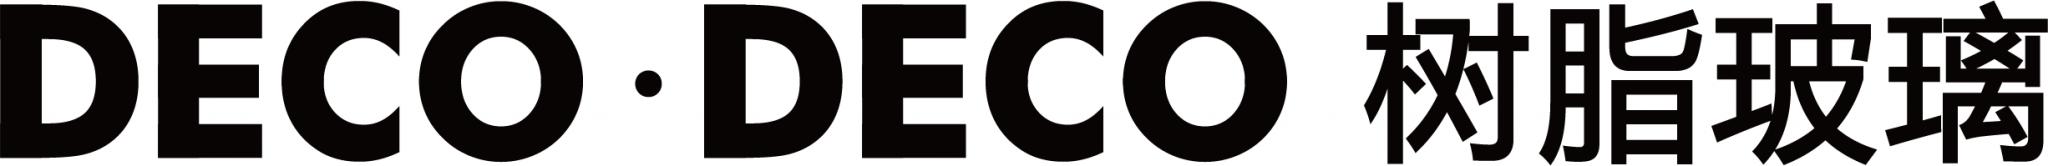 DECO · DECO  -  树脂玻璃